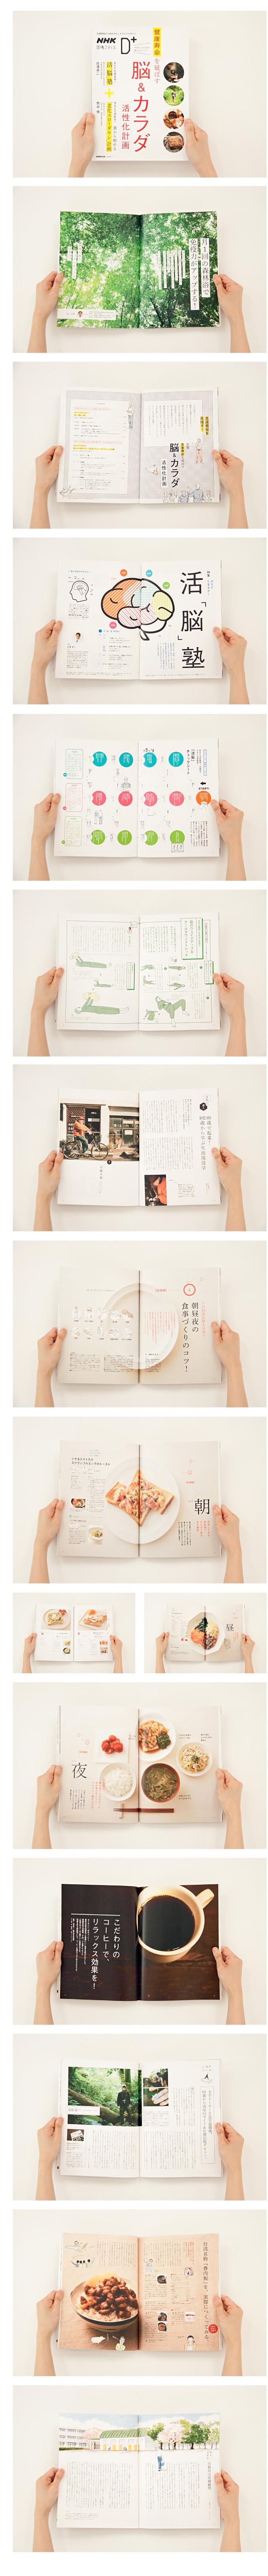 Http Www Nakamuragraph Com パンフレット デザイン エディトリアルデザイン リーフレット